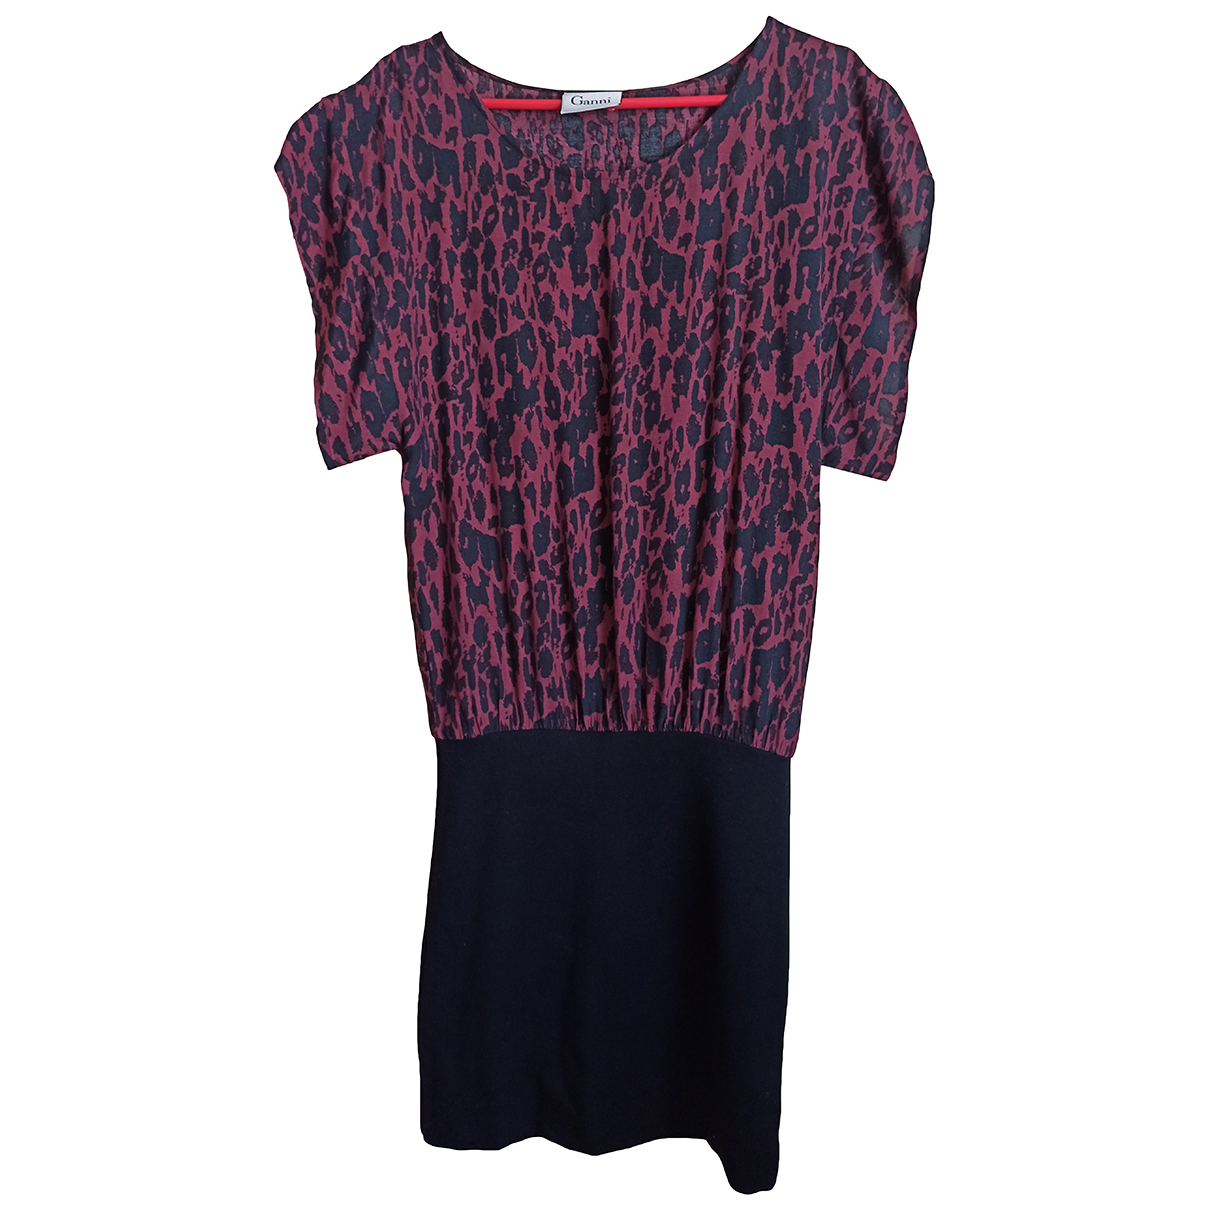 Ganni \N Kleid in  Bordeauxrot Polyester